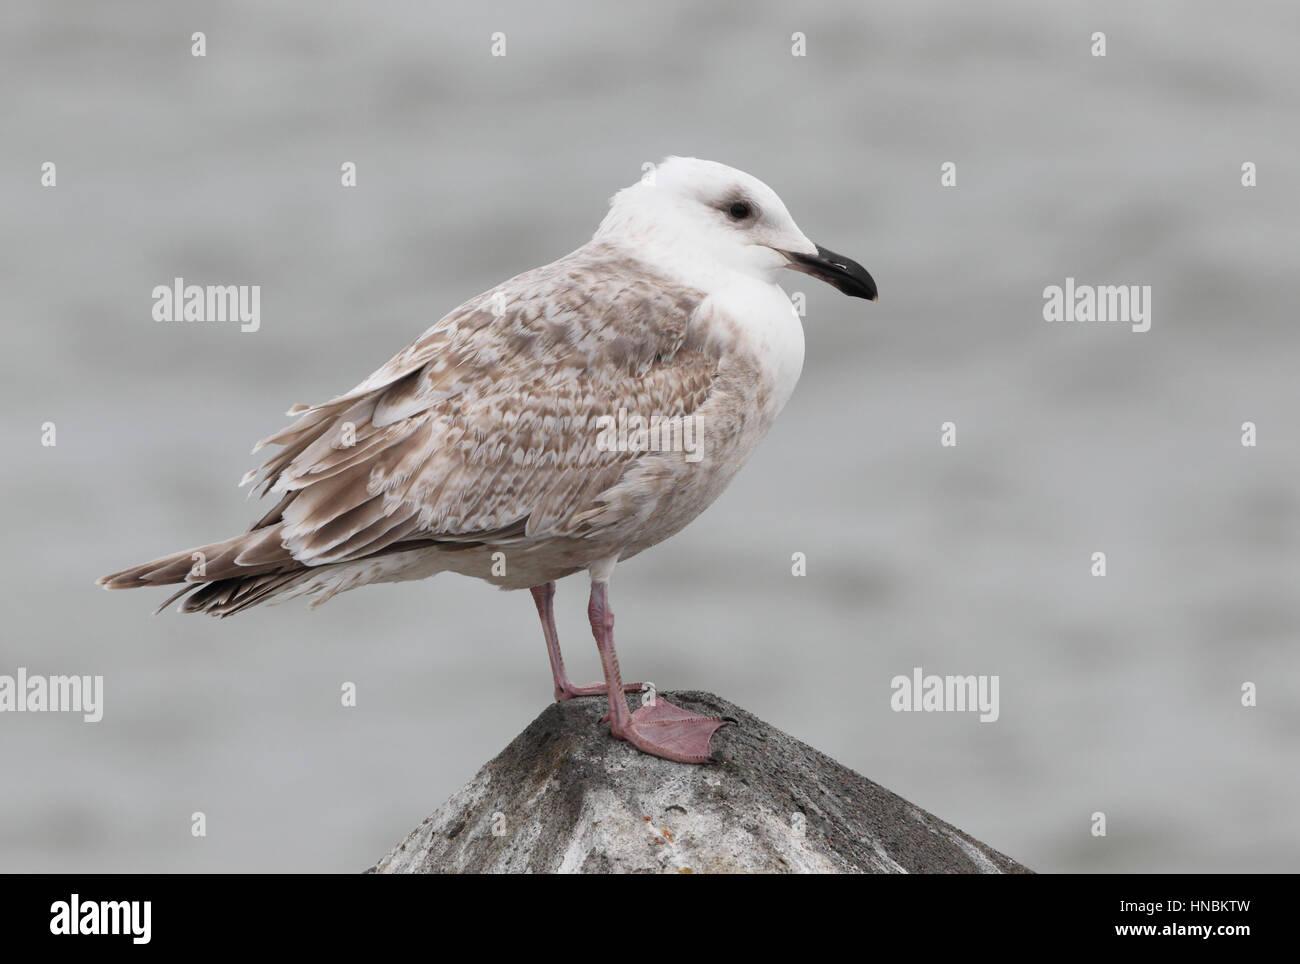 Immature Glaucous-winged Gull (Larus glaucescens) perched on rock on the Hokkaido coast, Japan - Stock Image